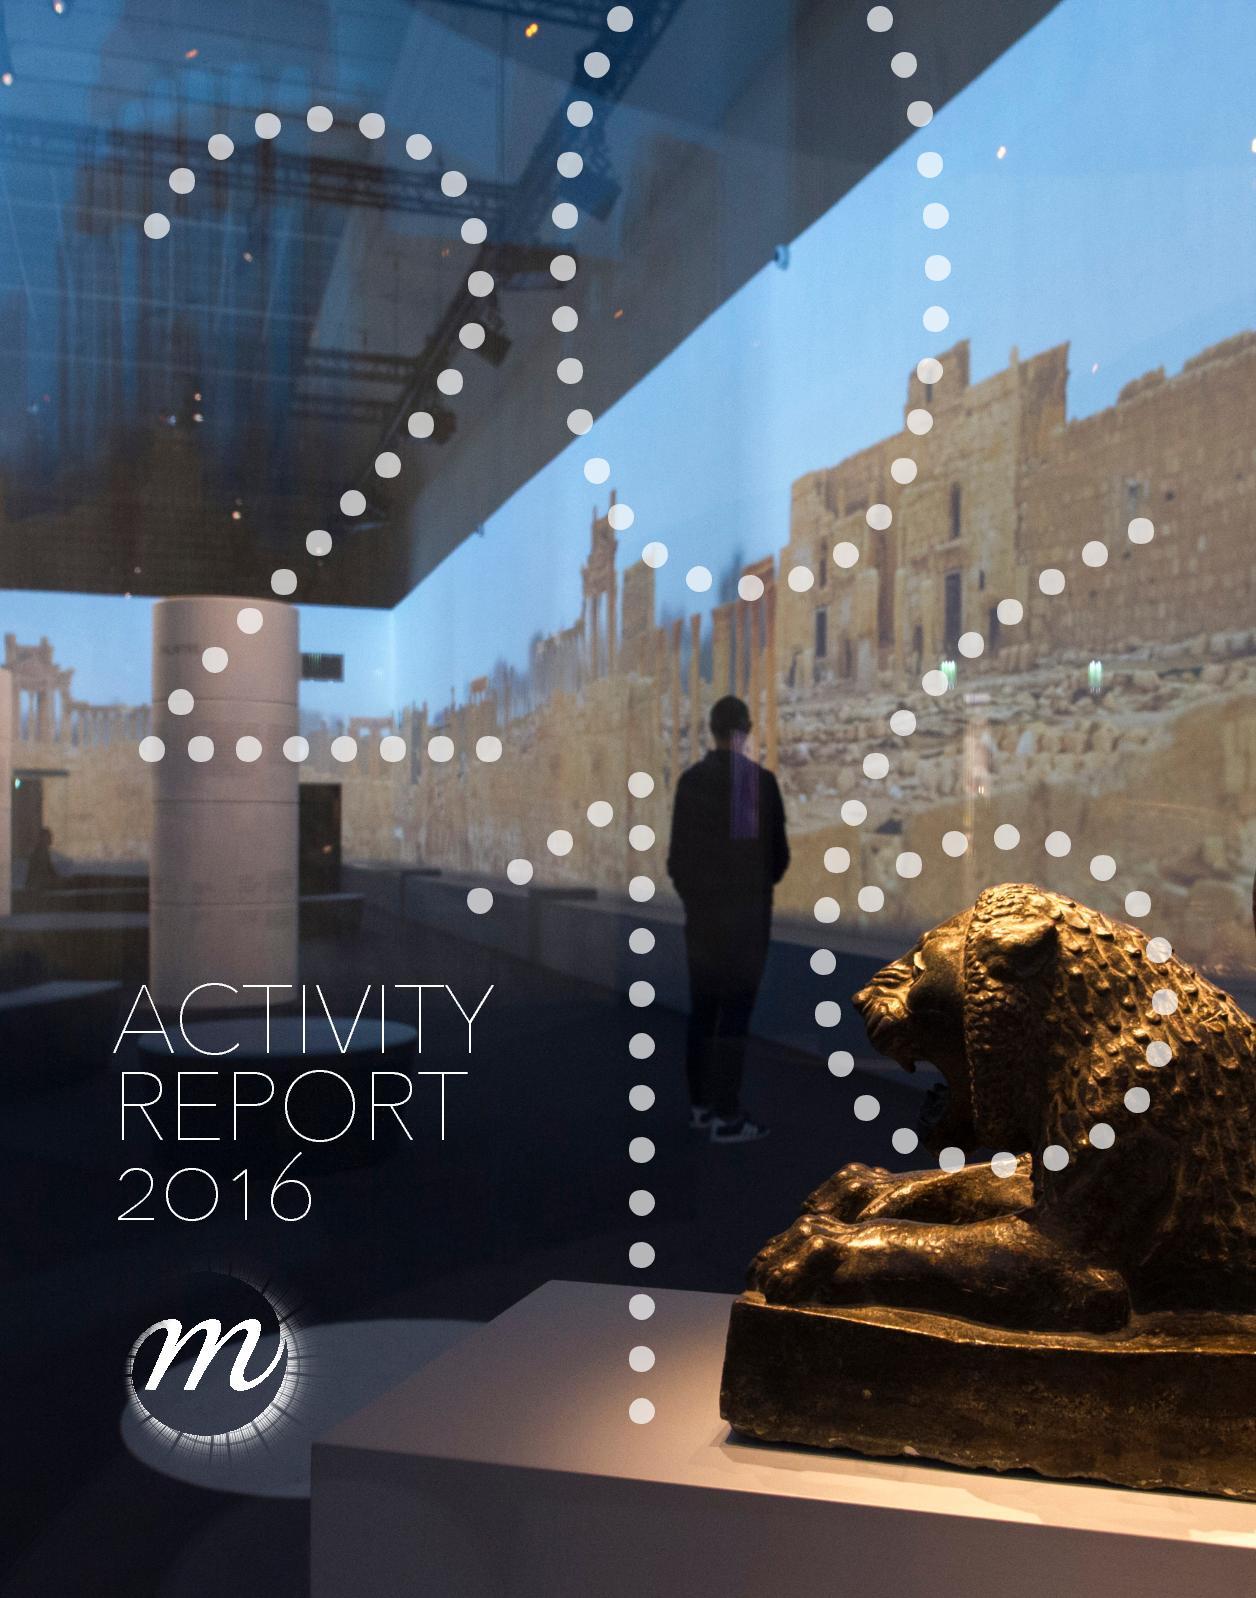 Calamo Activity Report 2016 Rmn Grand